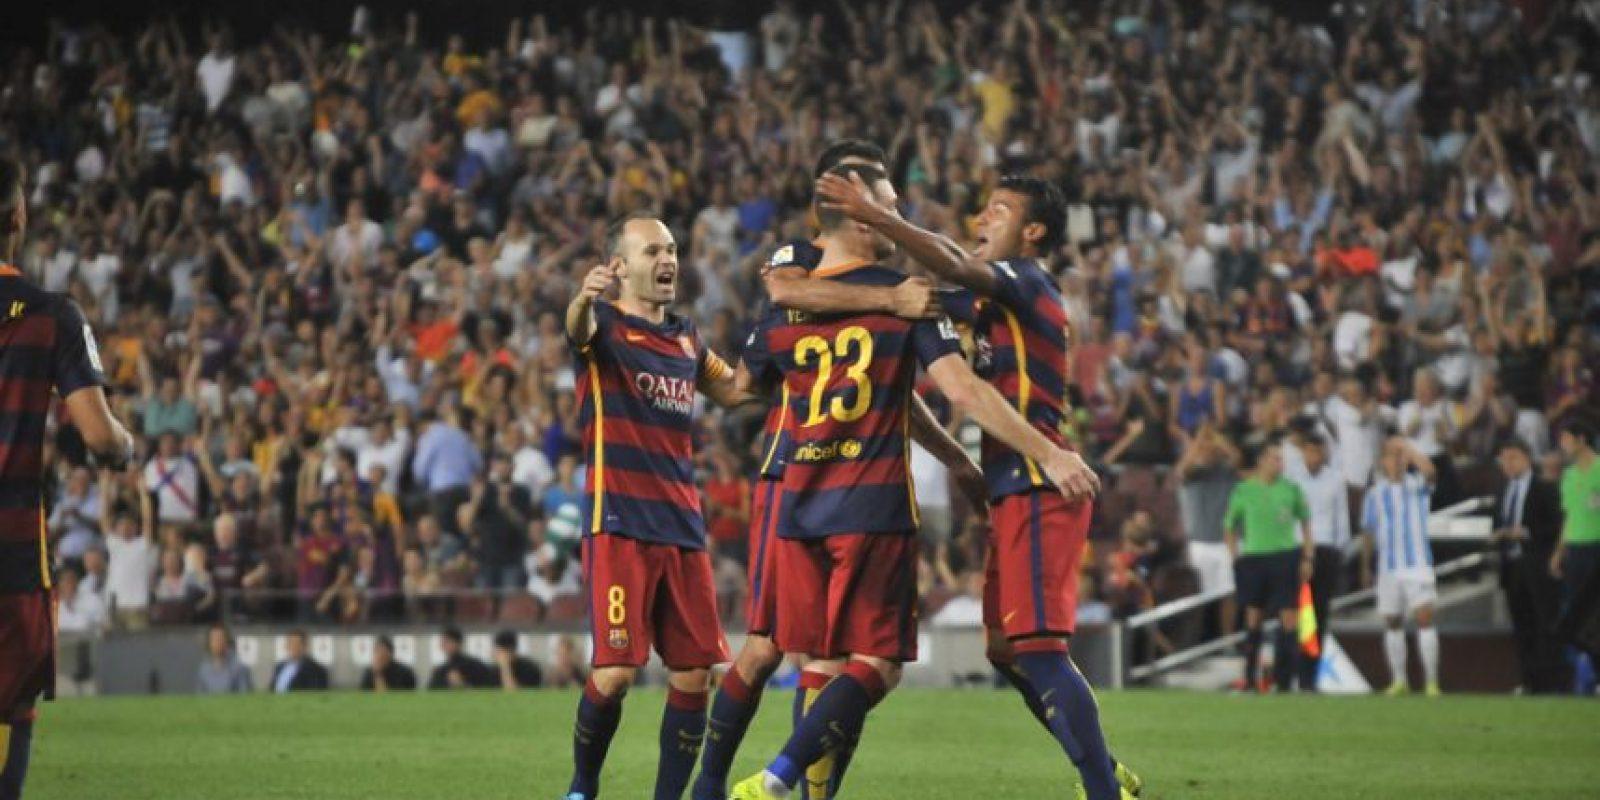 El único gol de la jornada lo marcó el defensor belga Thomas Vermaelen Foto:Ramón Mompió